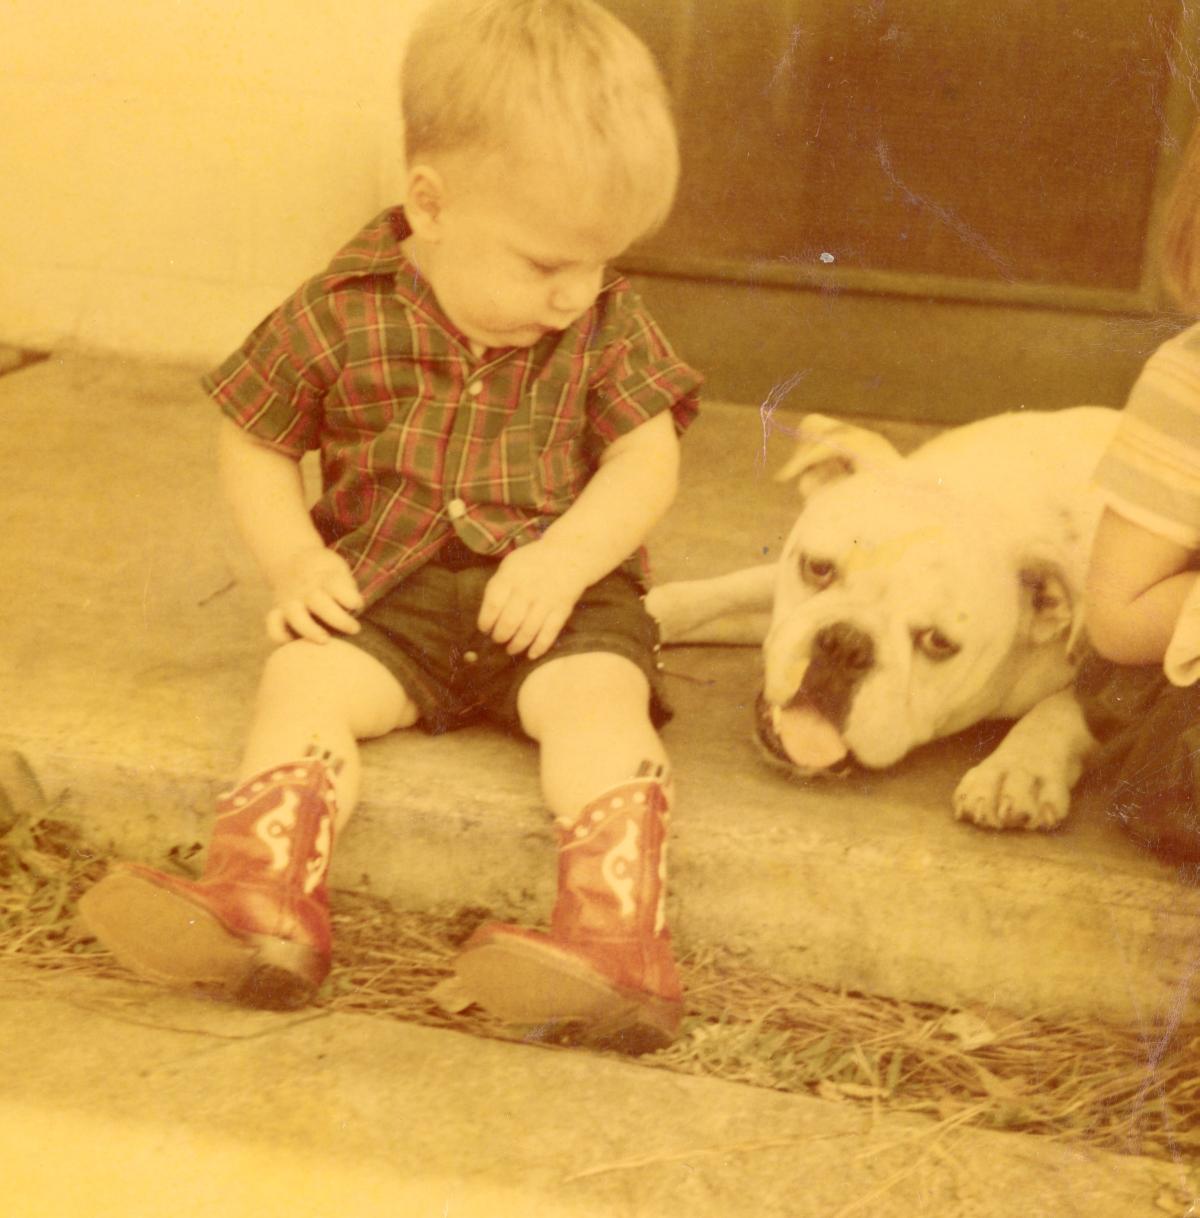 Joseph B. Raney Jr. with pet bulldog Leo.